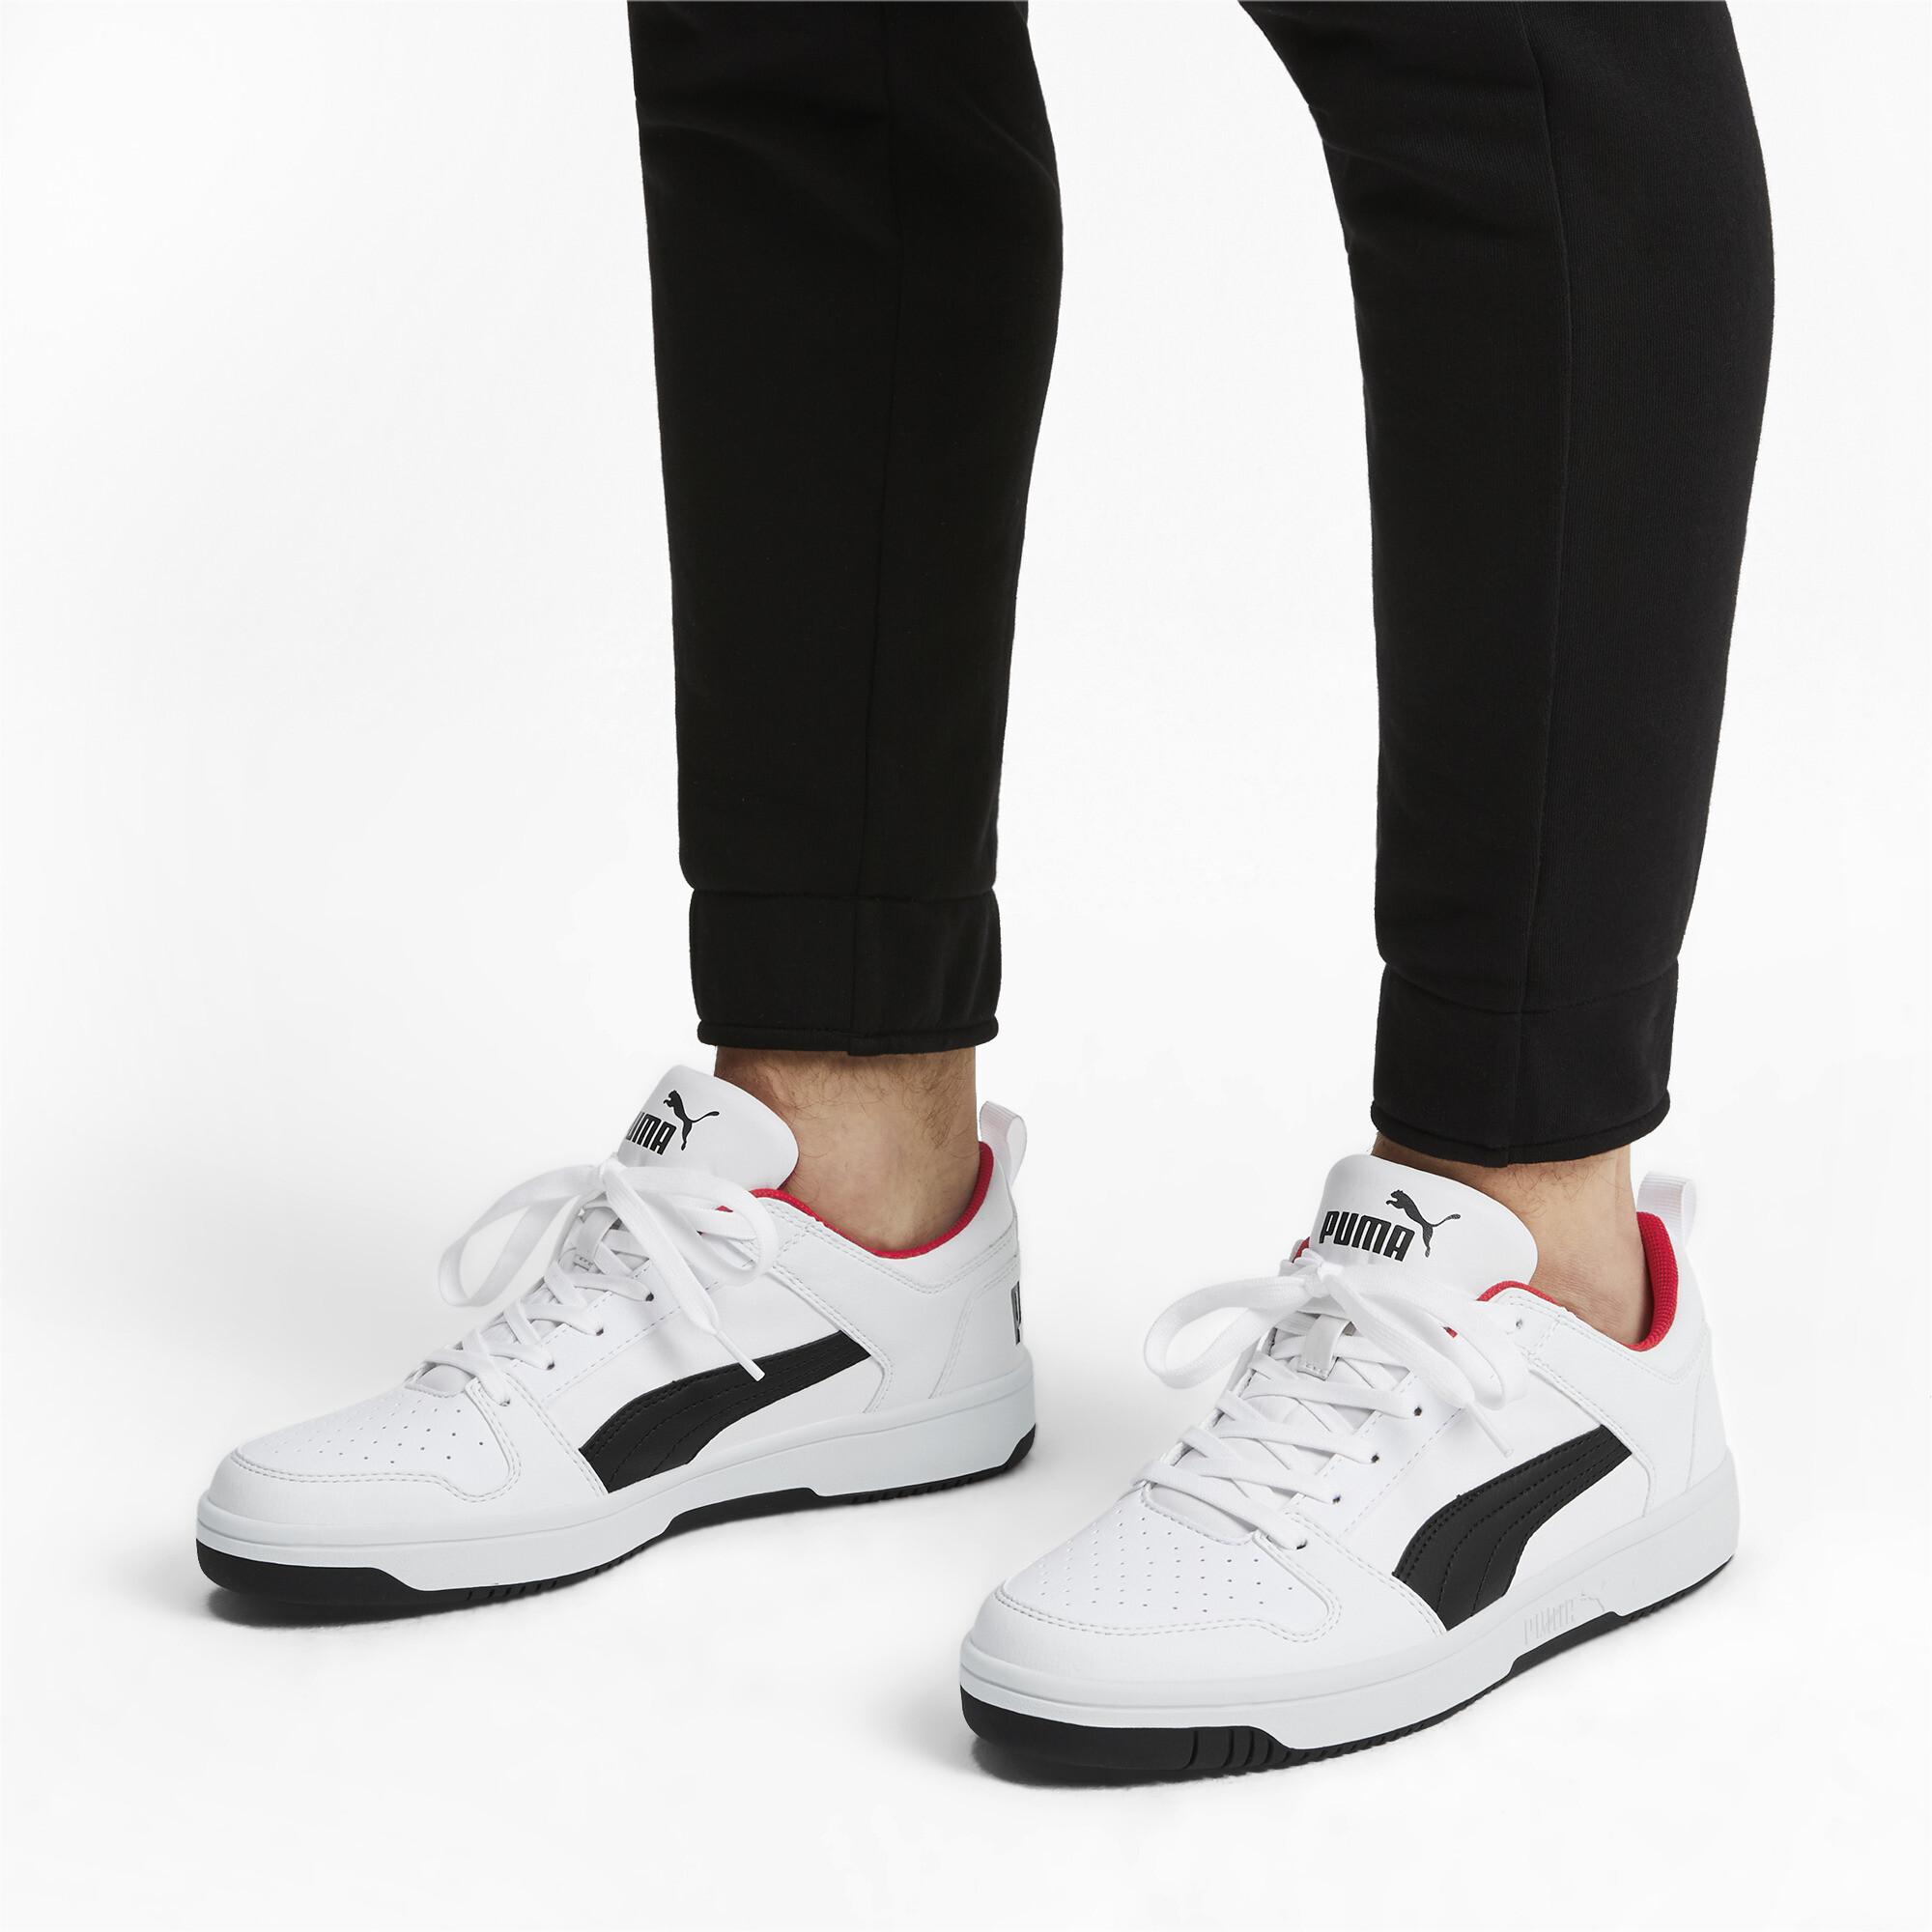 PUMA-PUMA-Rebound-LayUp-Lo-Men-039-s-Sneakers-Men-Shoe-Basics miniatura 14